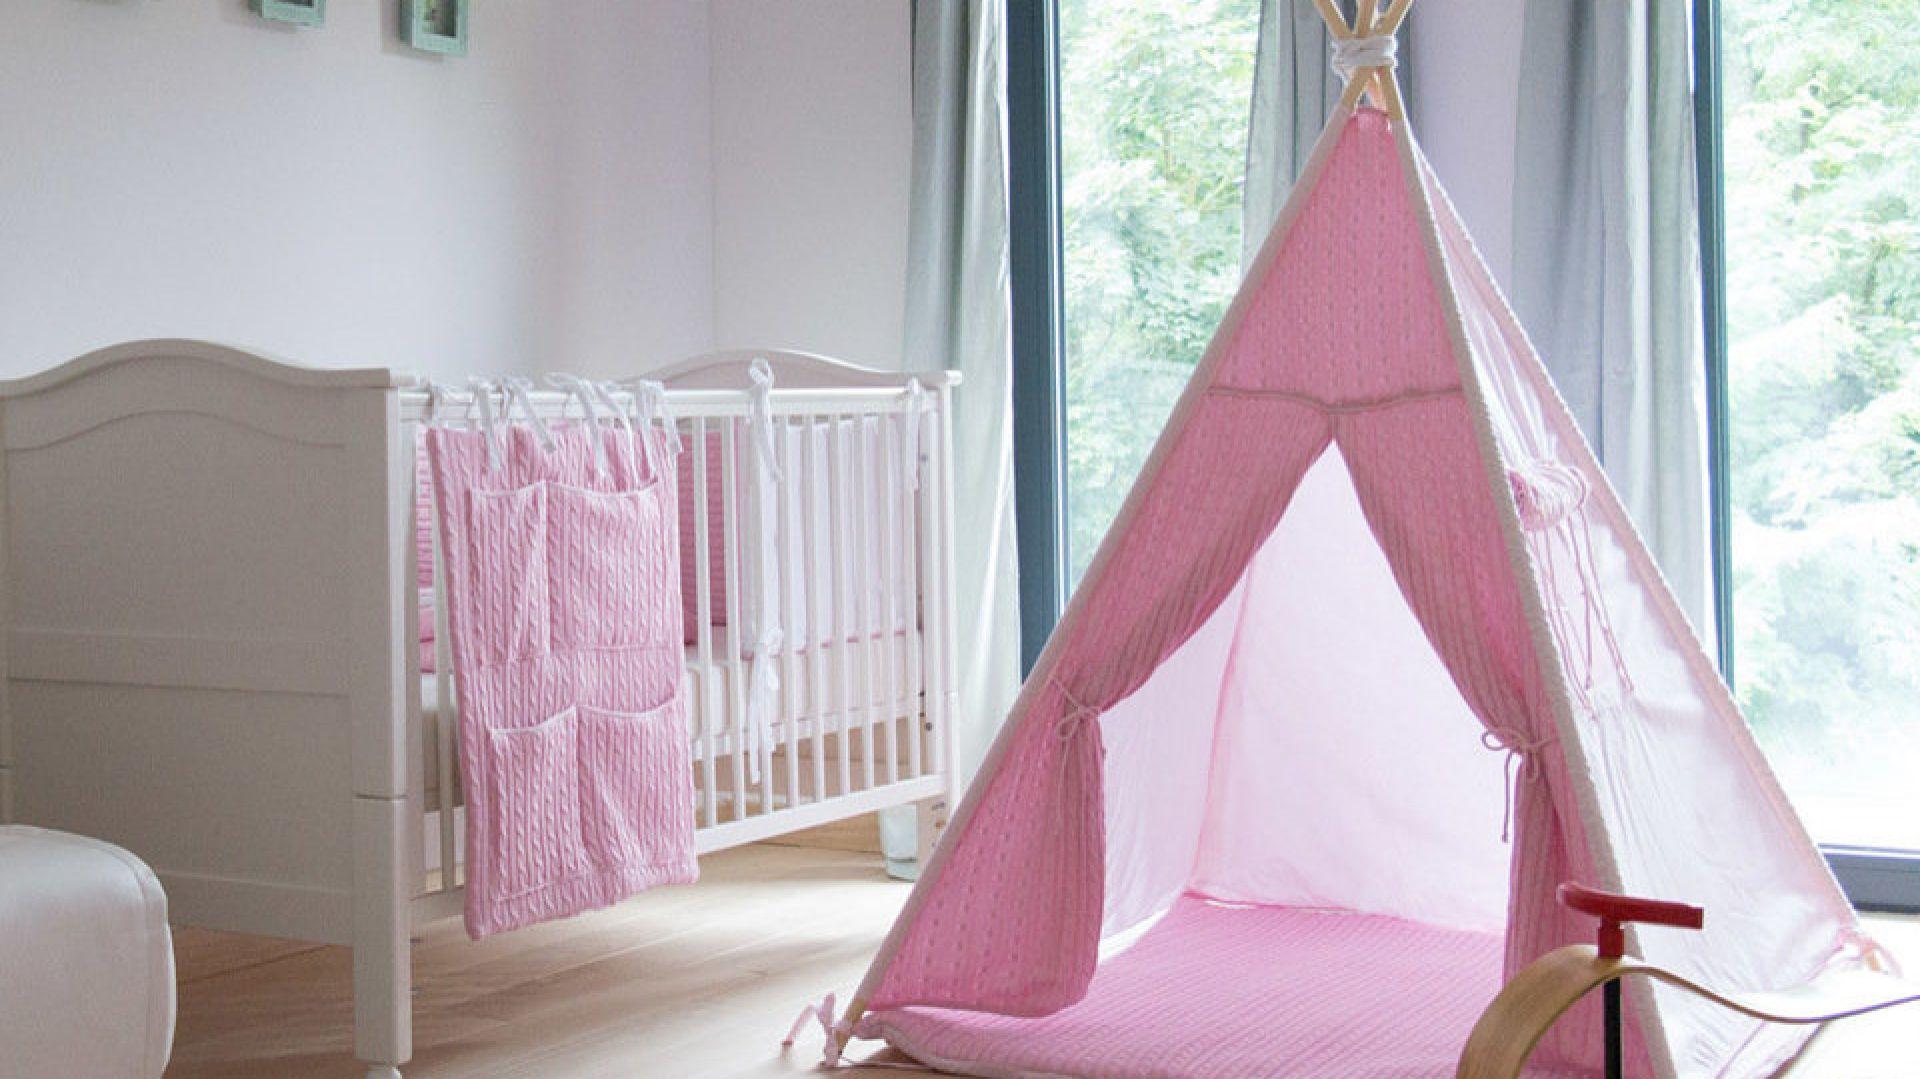 Malmo Pink Teepee. Fot. Muzpony